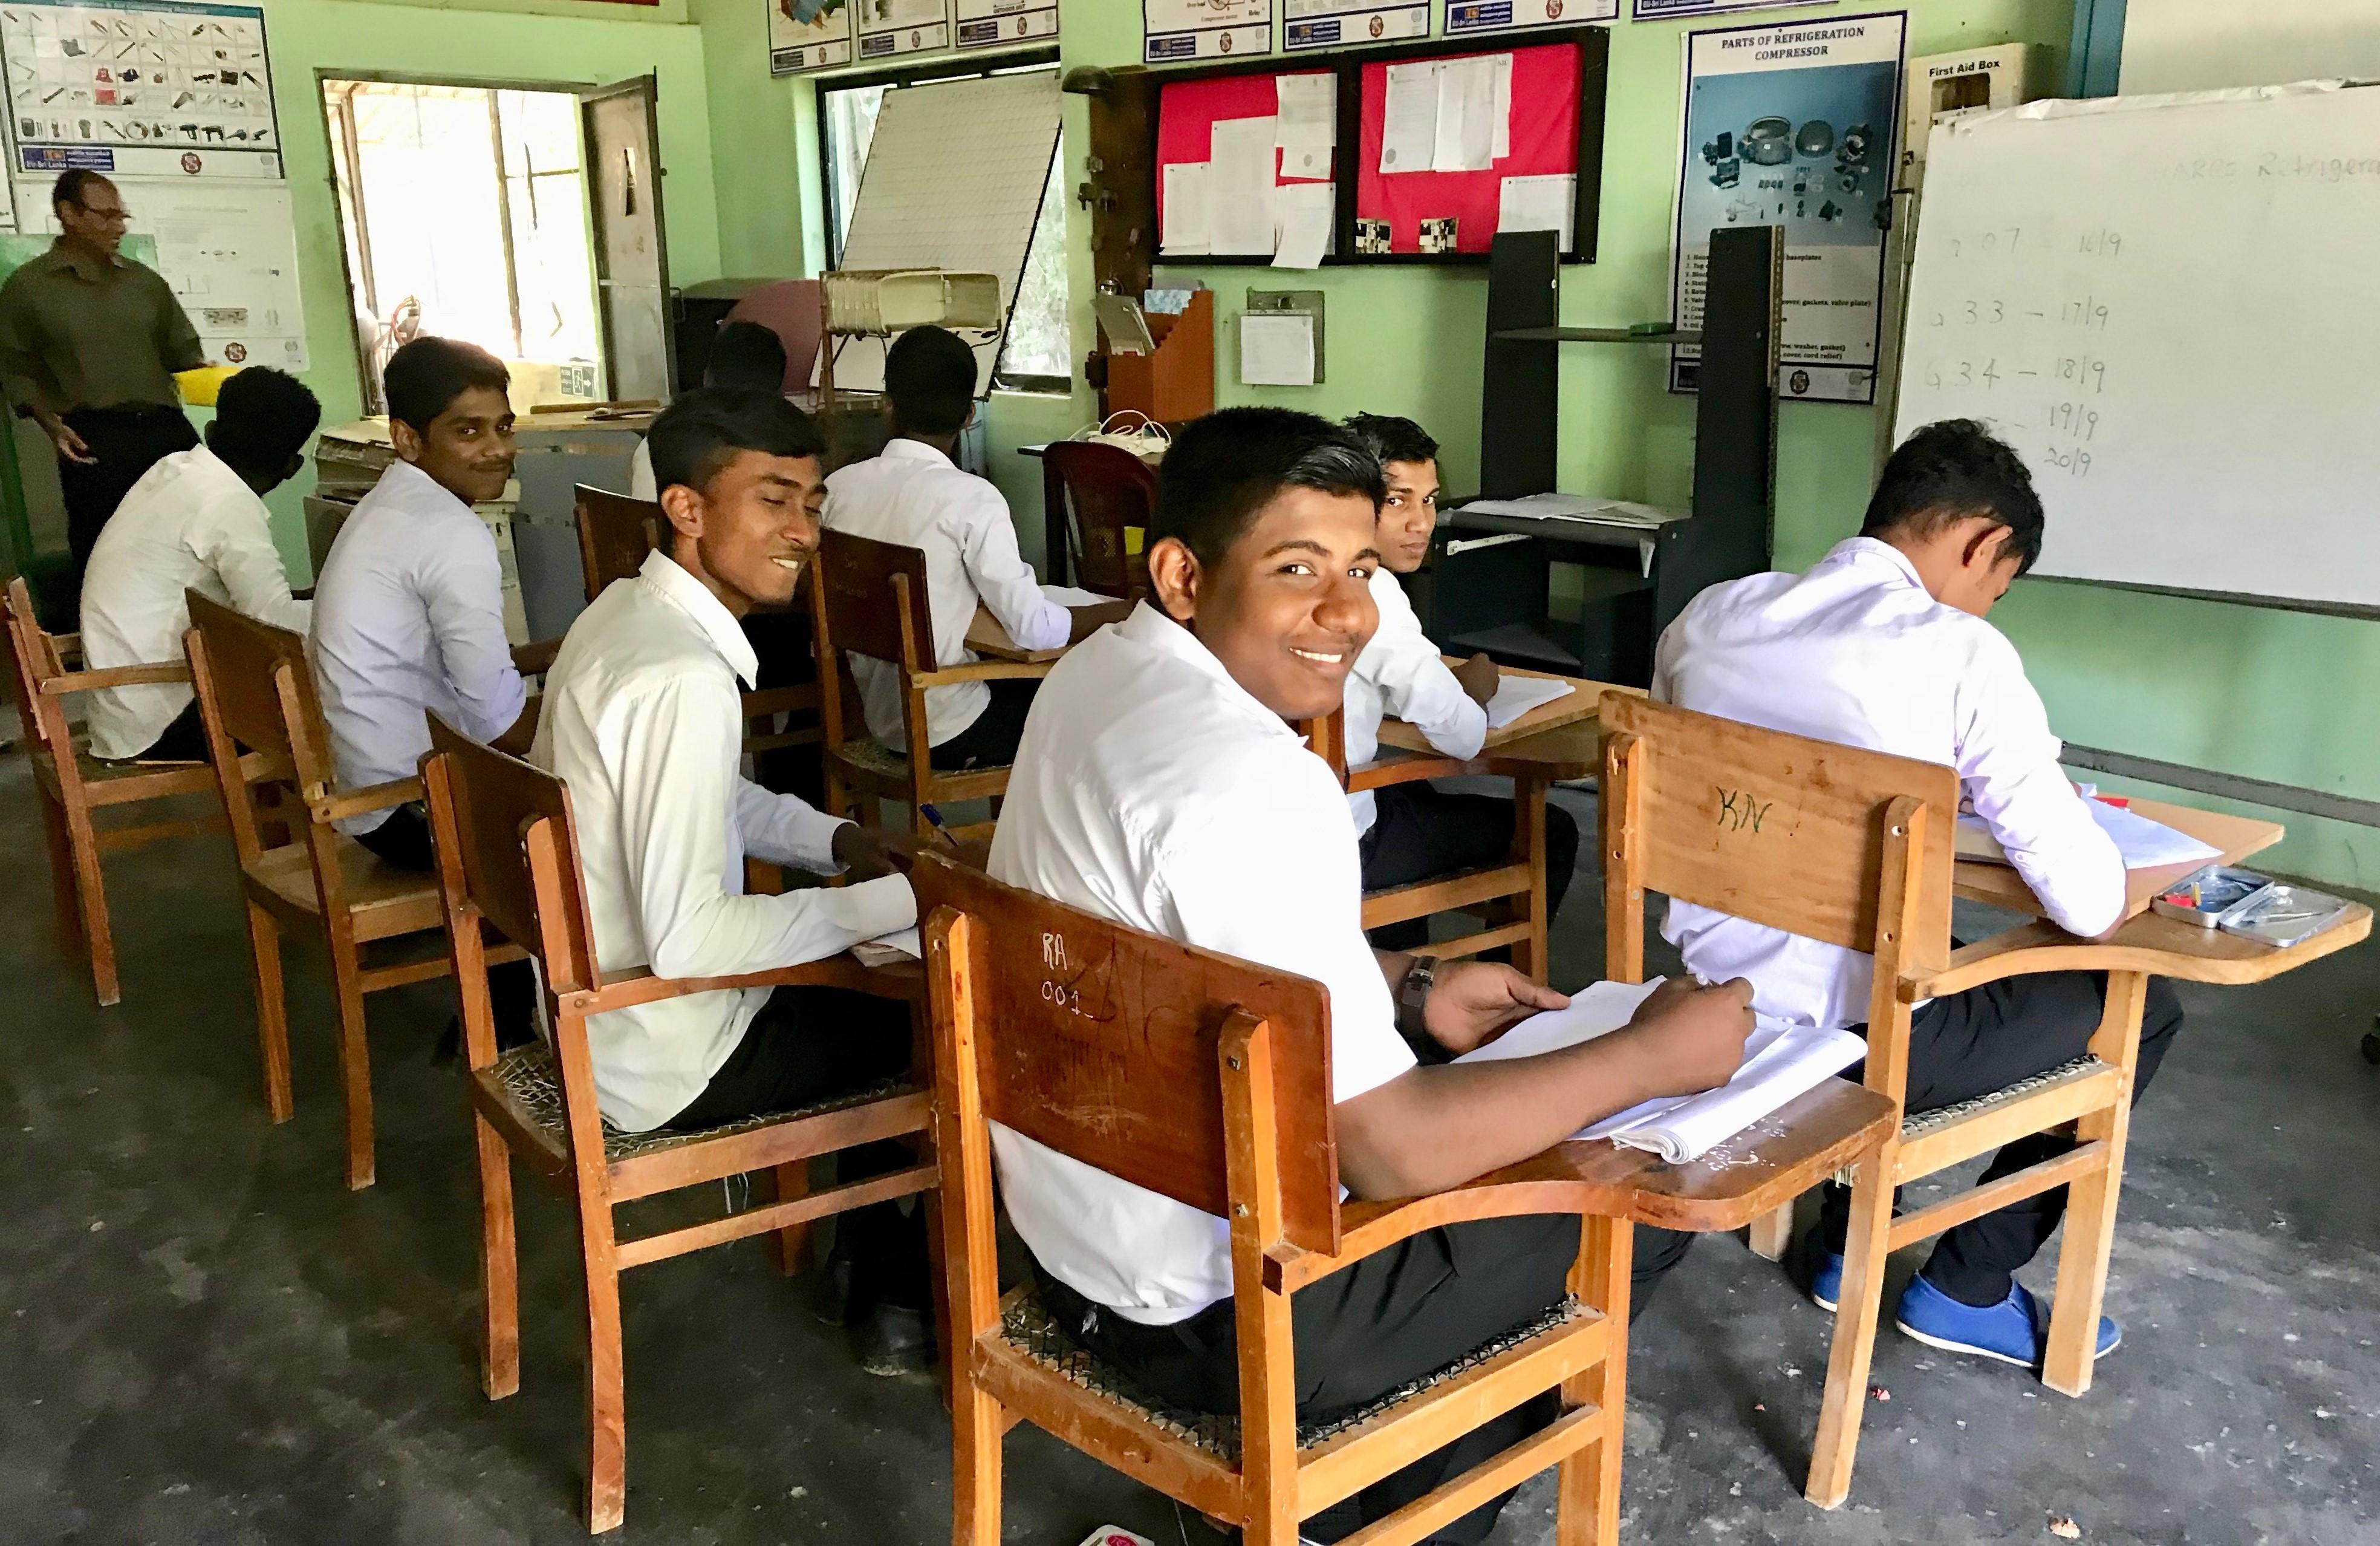 Refrigeration class, Sri Lanka, 2019